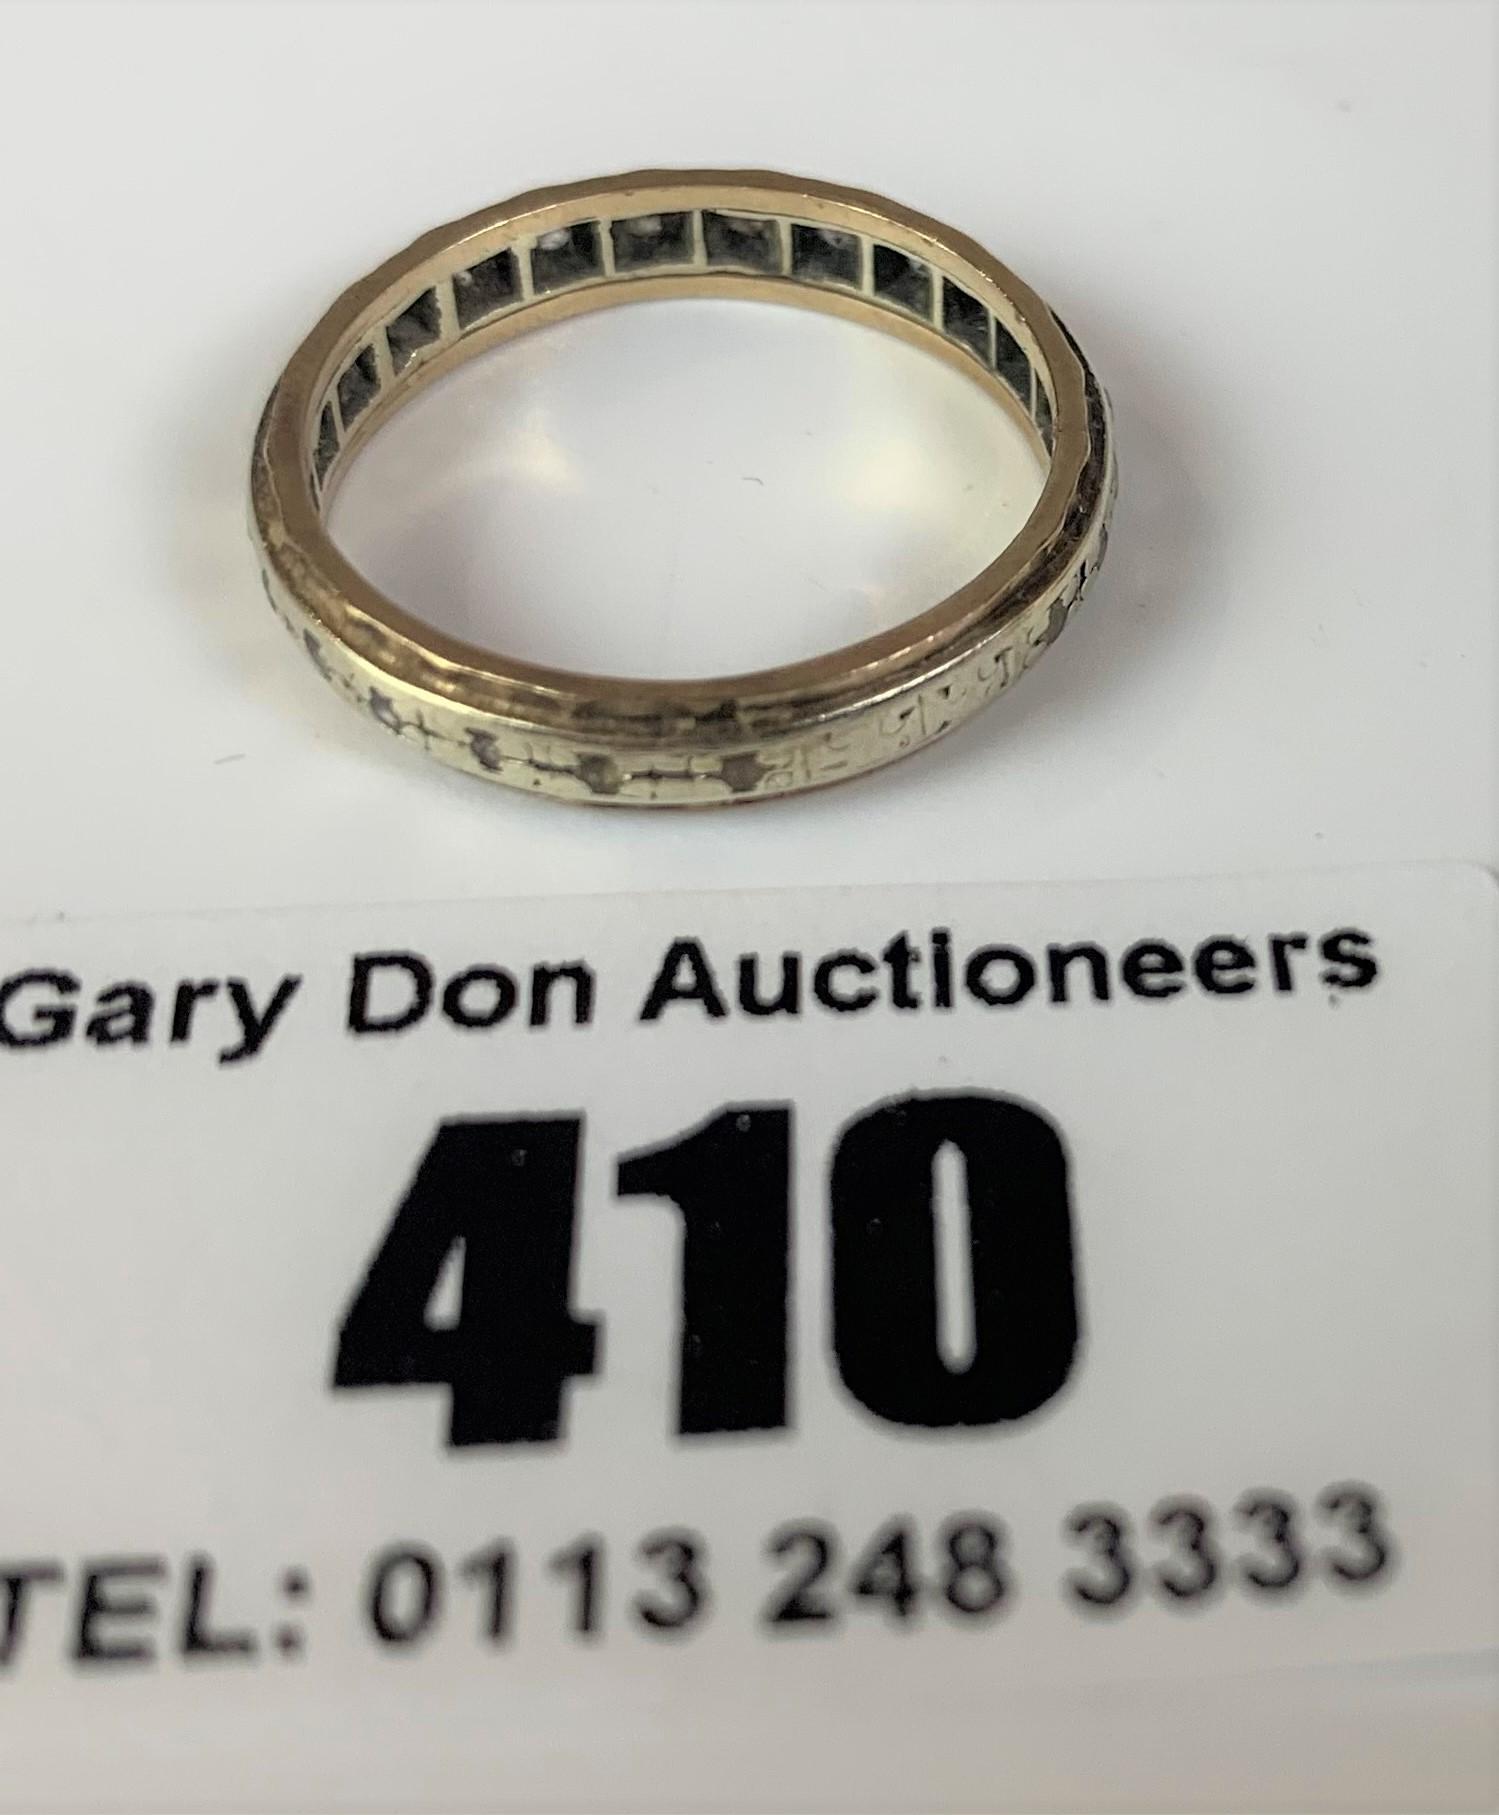 9k gold engraved ring, size N, w: 2.3 gms